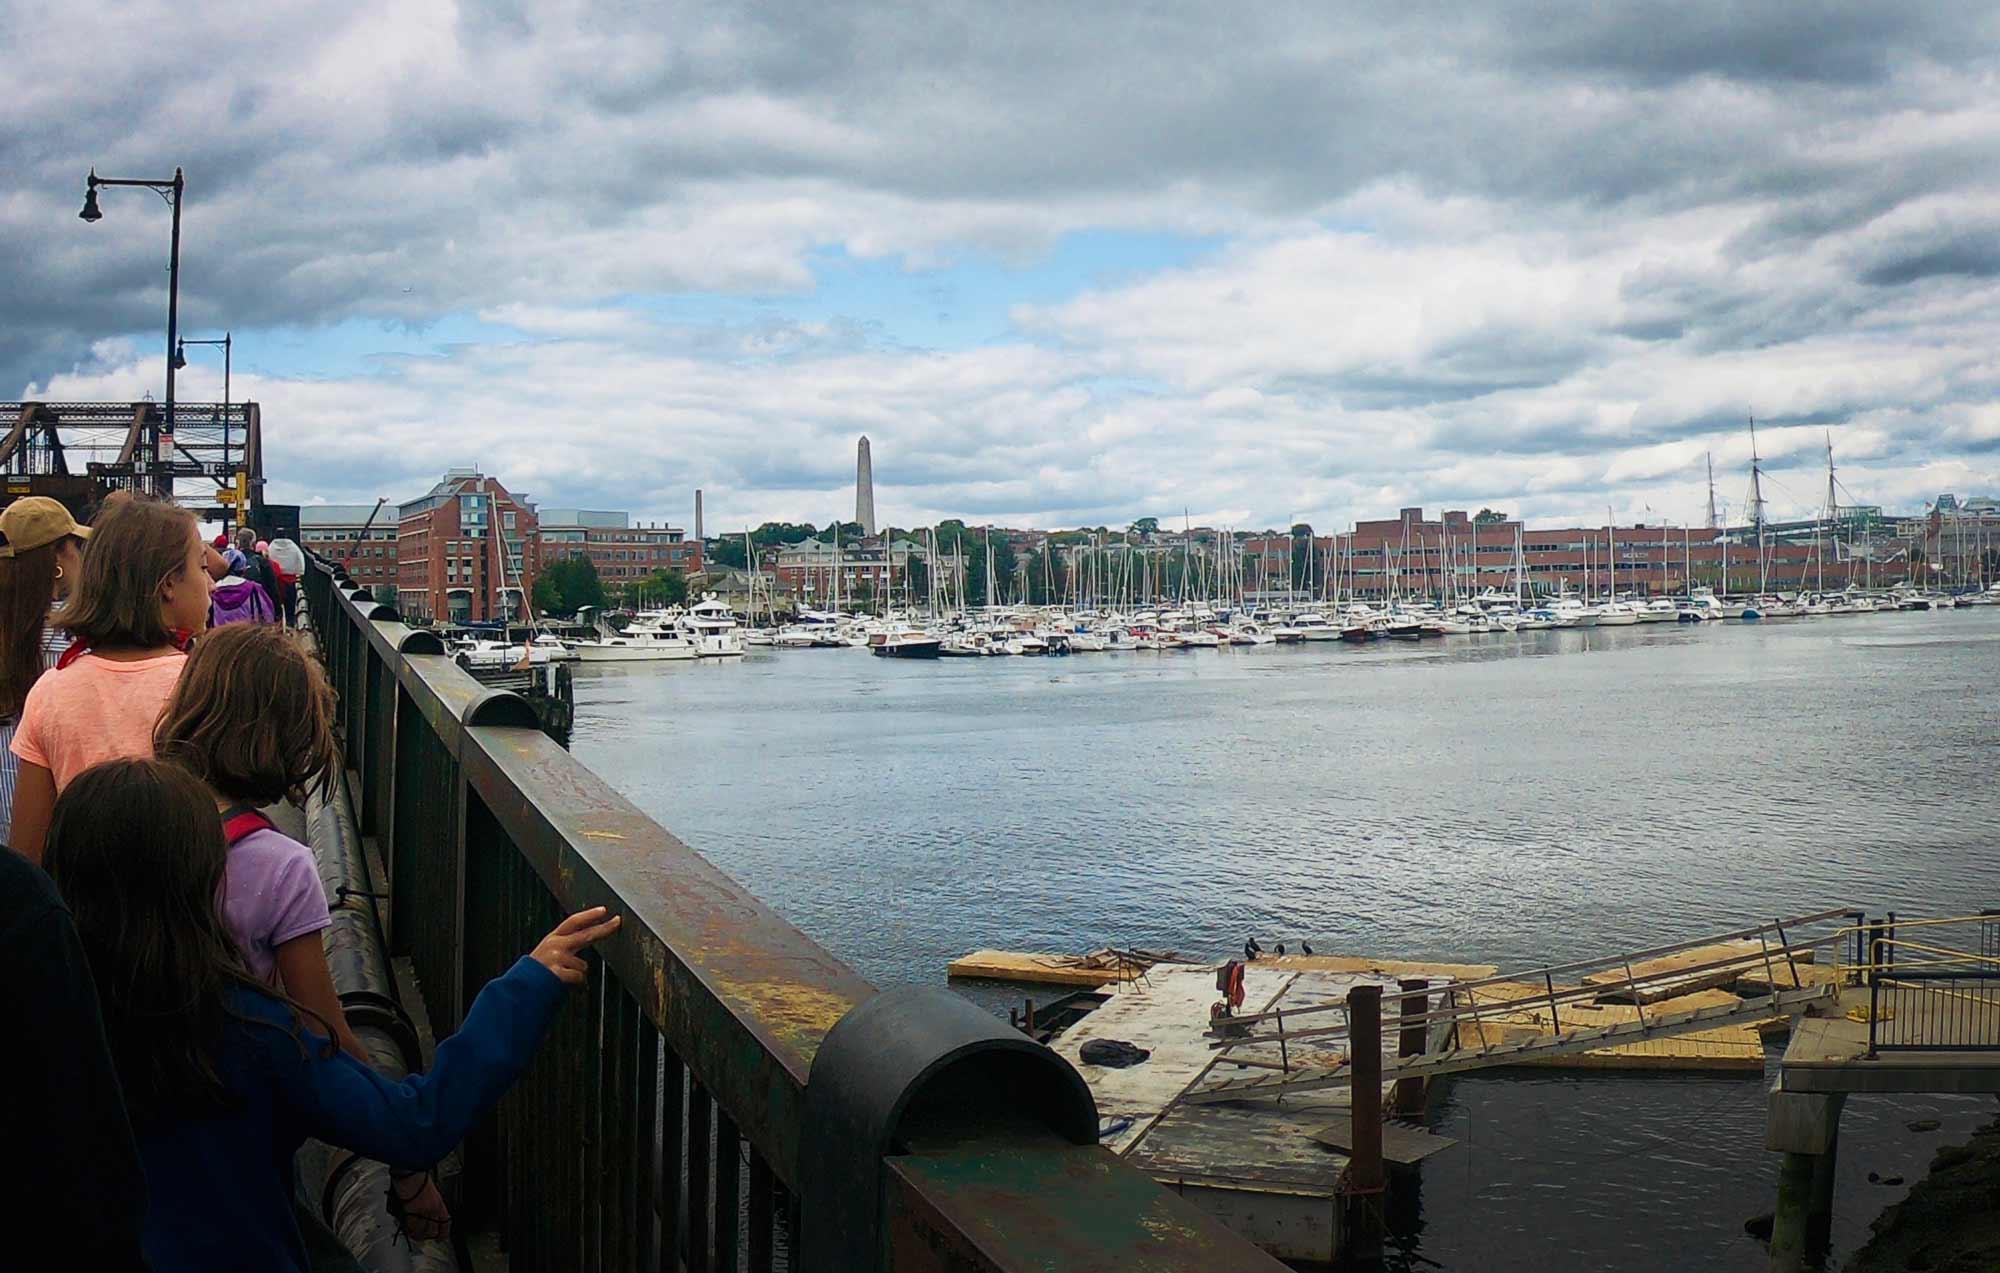 People walking along pedestrian path on Charlestown Bridge in Boston, Massachusetts